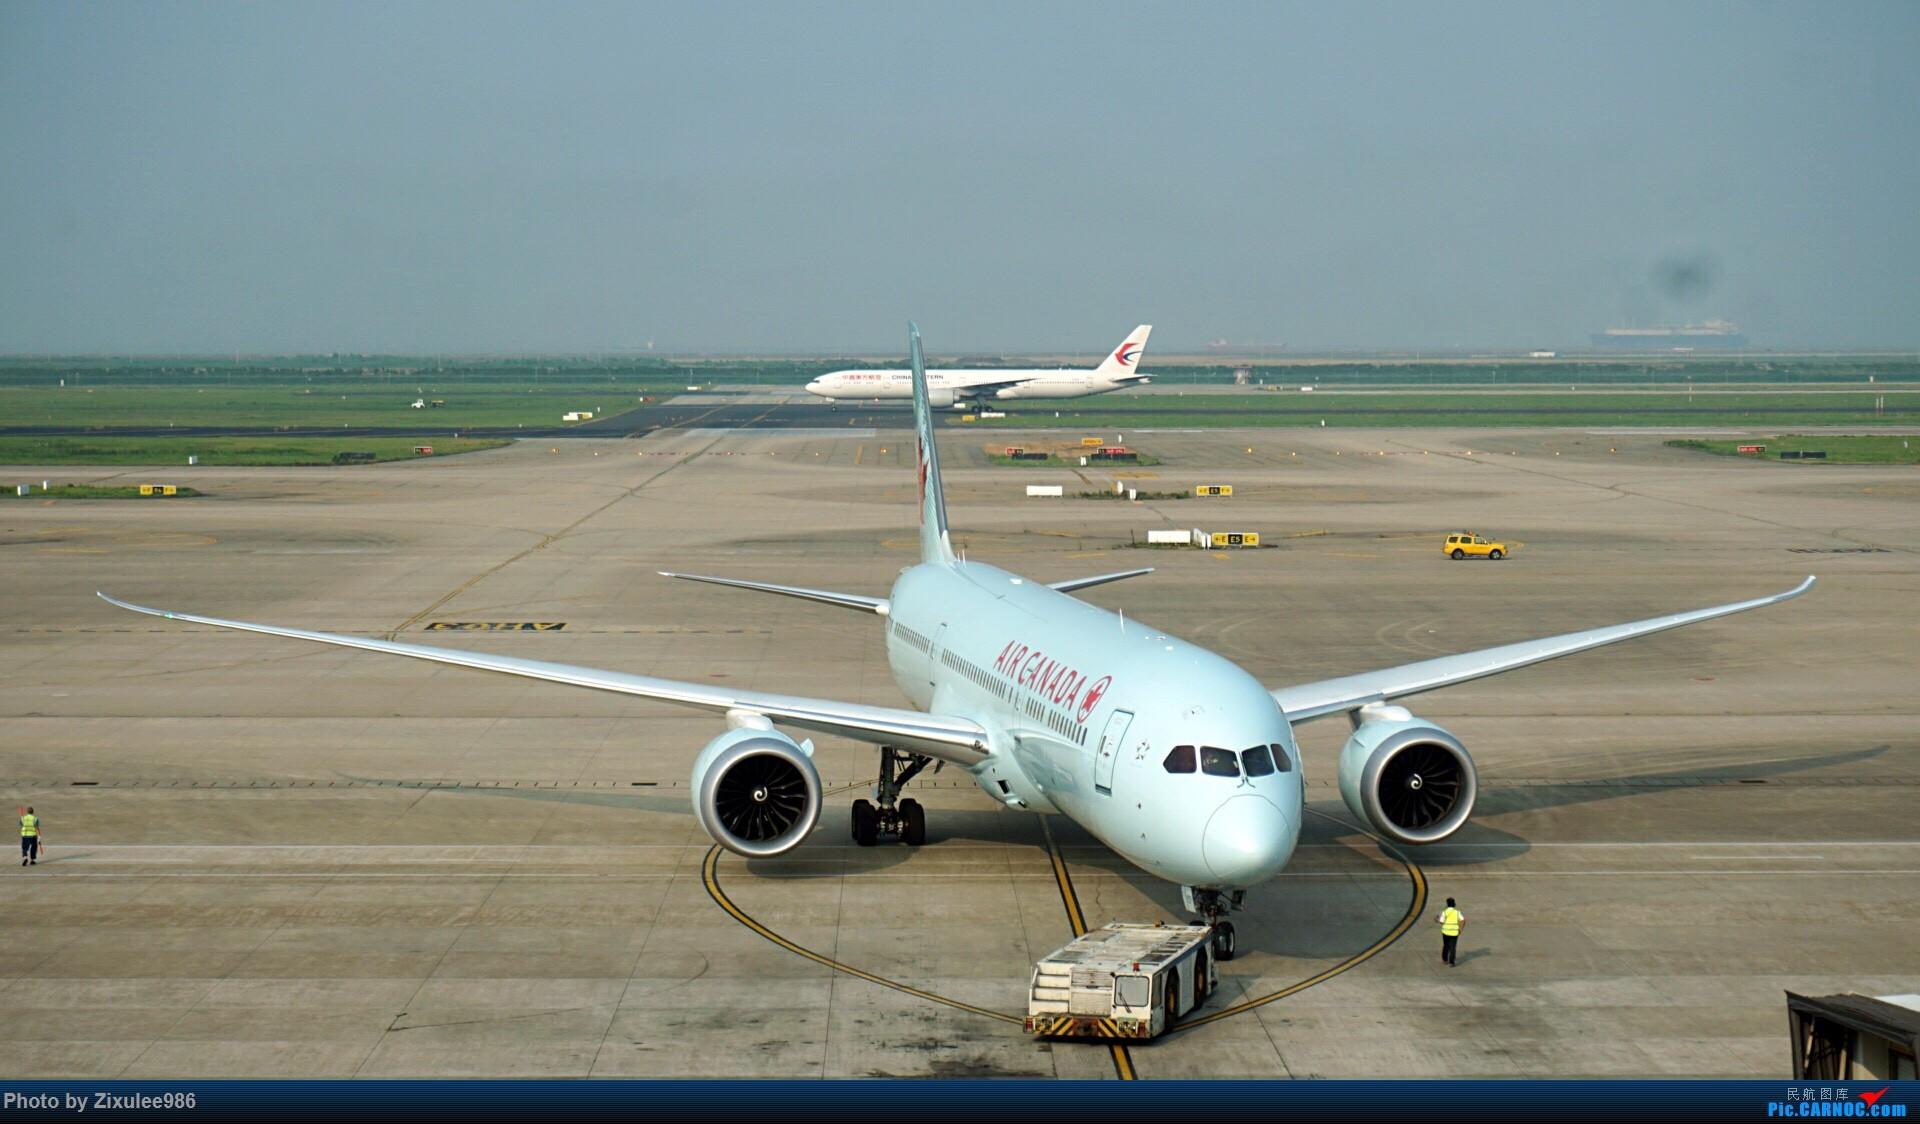 Re:[原创]加拿大21日游学之旅(一)~JJN-PVG-YYZ..(内含flightlog)~第一次发游记~多图缓更请谅解 BOEING 787-9 C-FGDZ 中国上海浦东国际机场